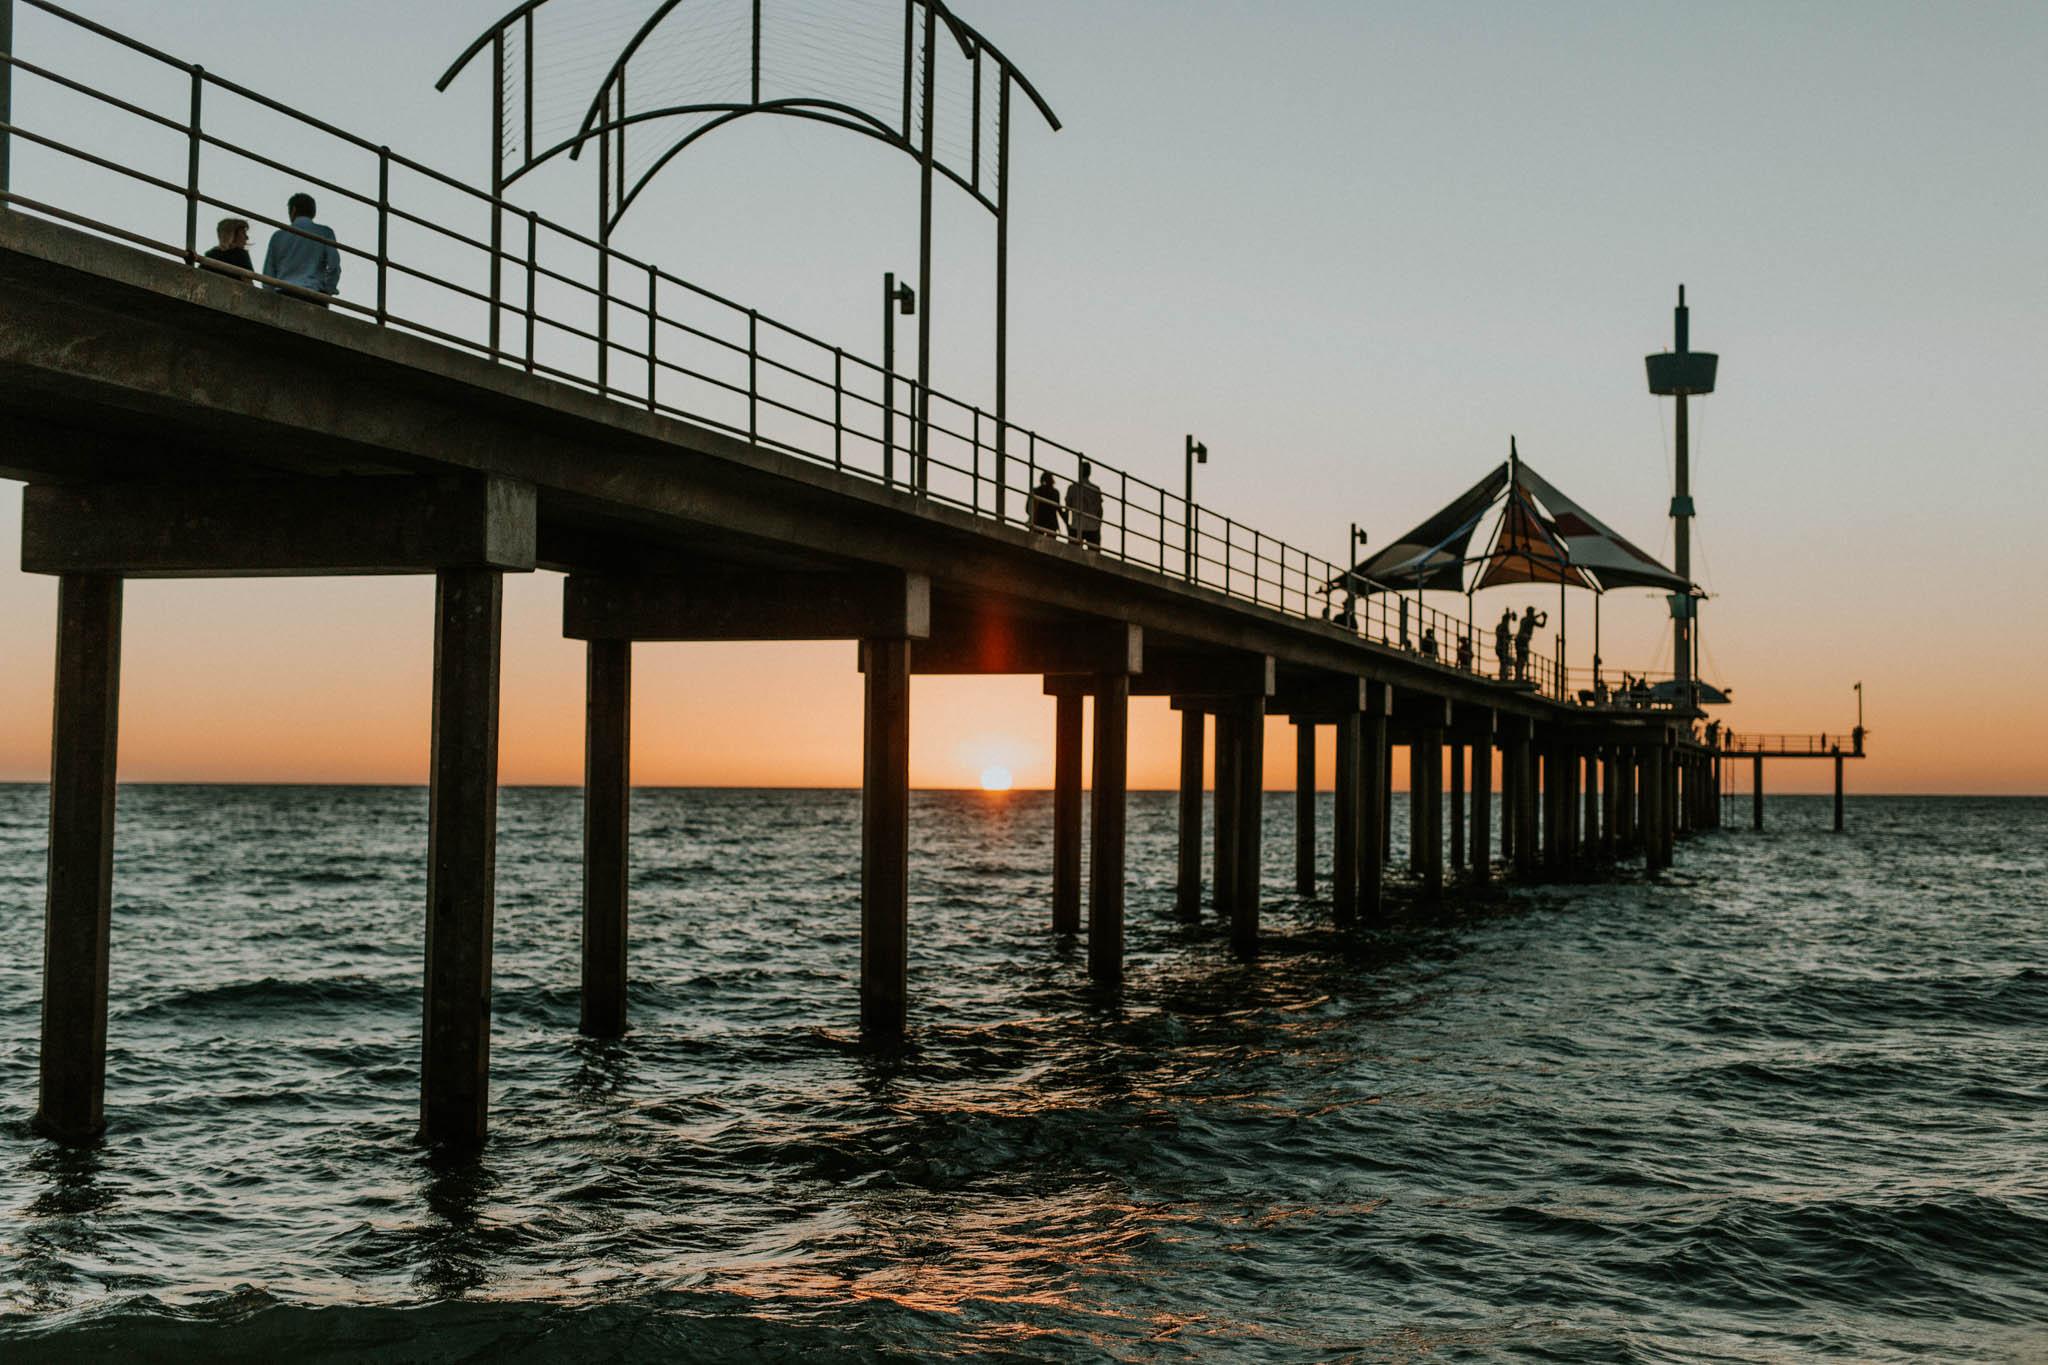 brighton-pier-south-australia-benjaminandrew.jpg